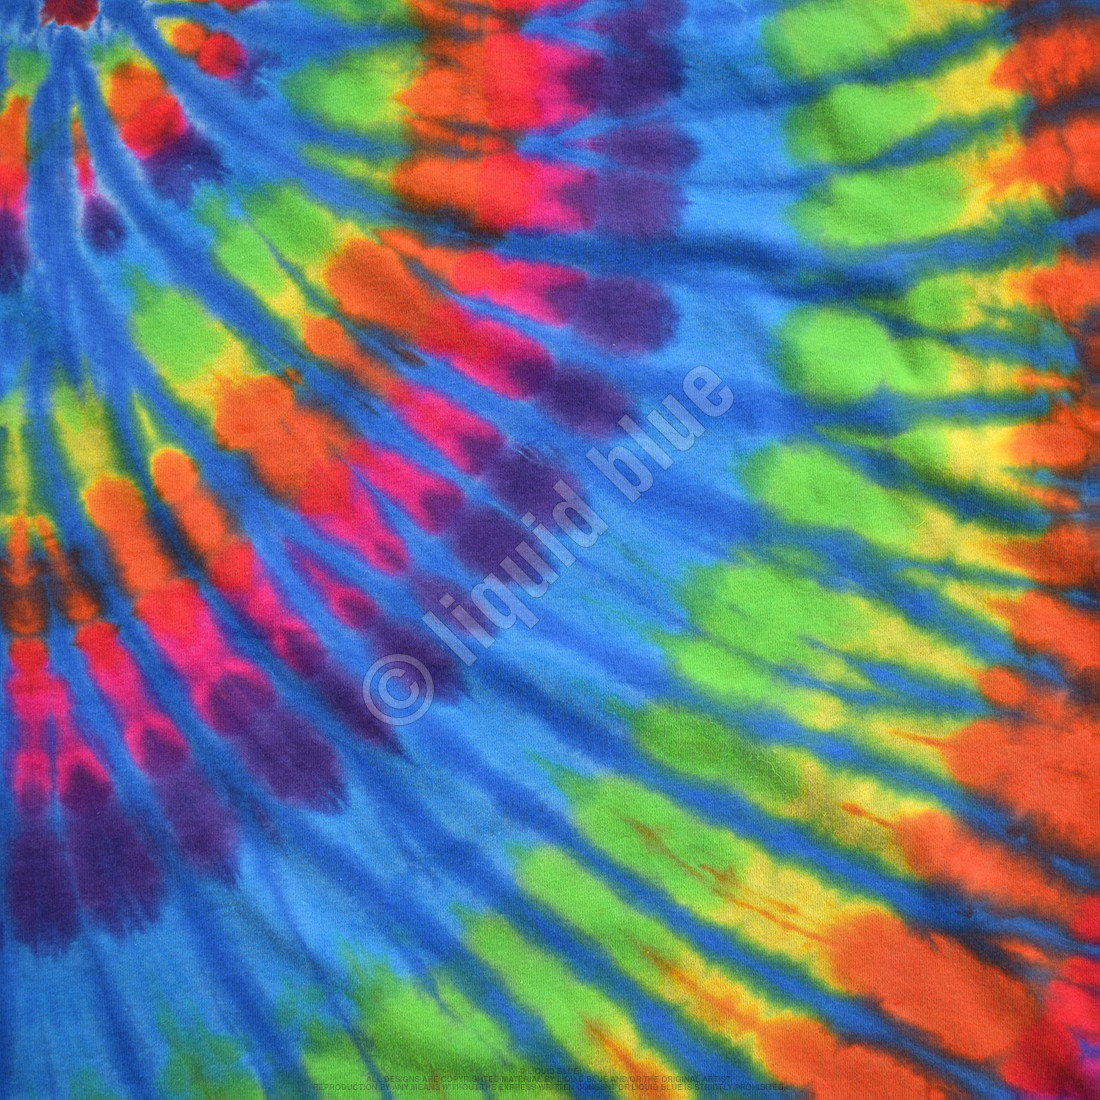 Rainbow Blue Streak Unprinted Tie-Dye T-Shirt